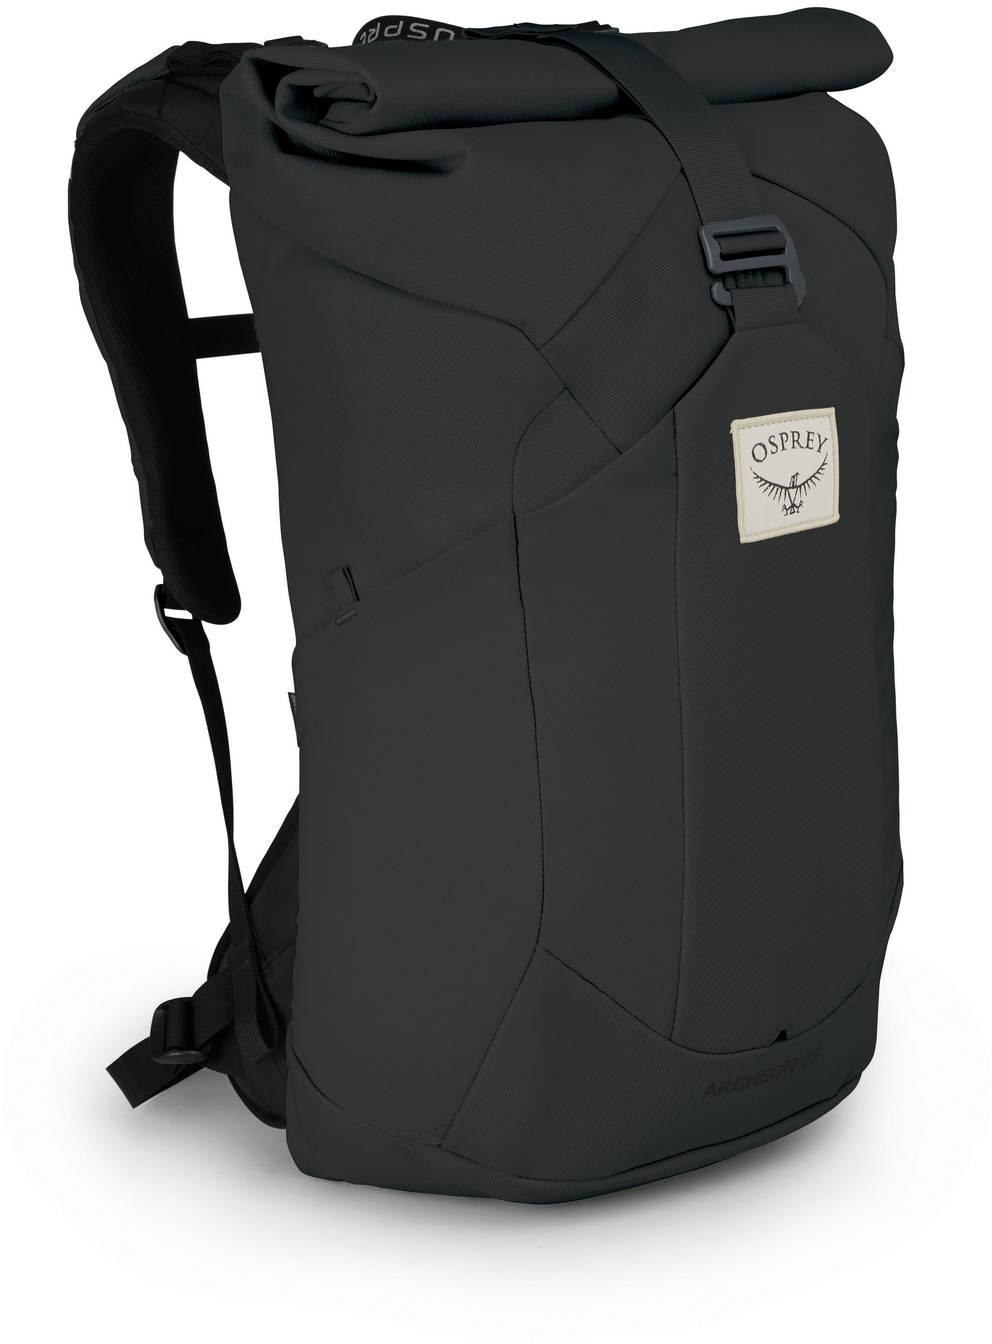 Городские рюкзаки Рюкзак Osprey Archeon 25 M's Stonewash Black Archeon_M_25_S20_Side_Stonewash_Black_web.jpg